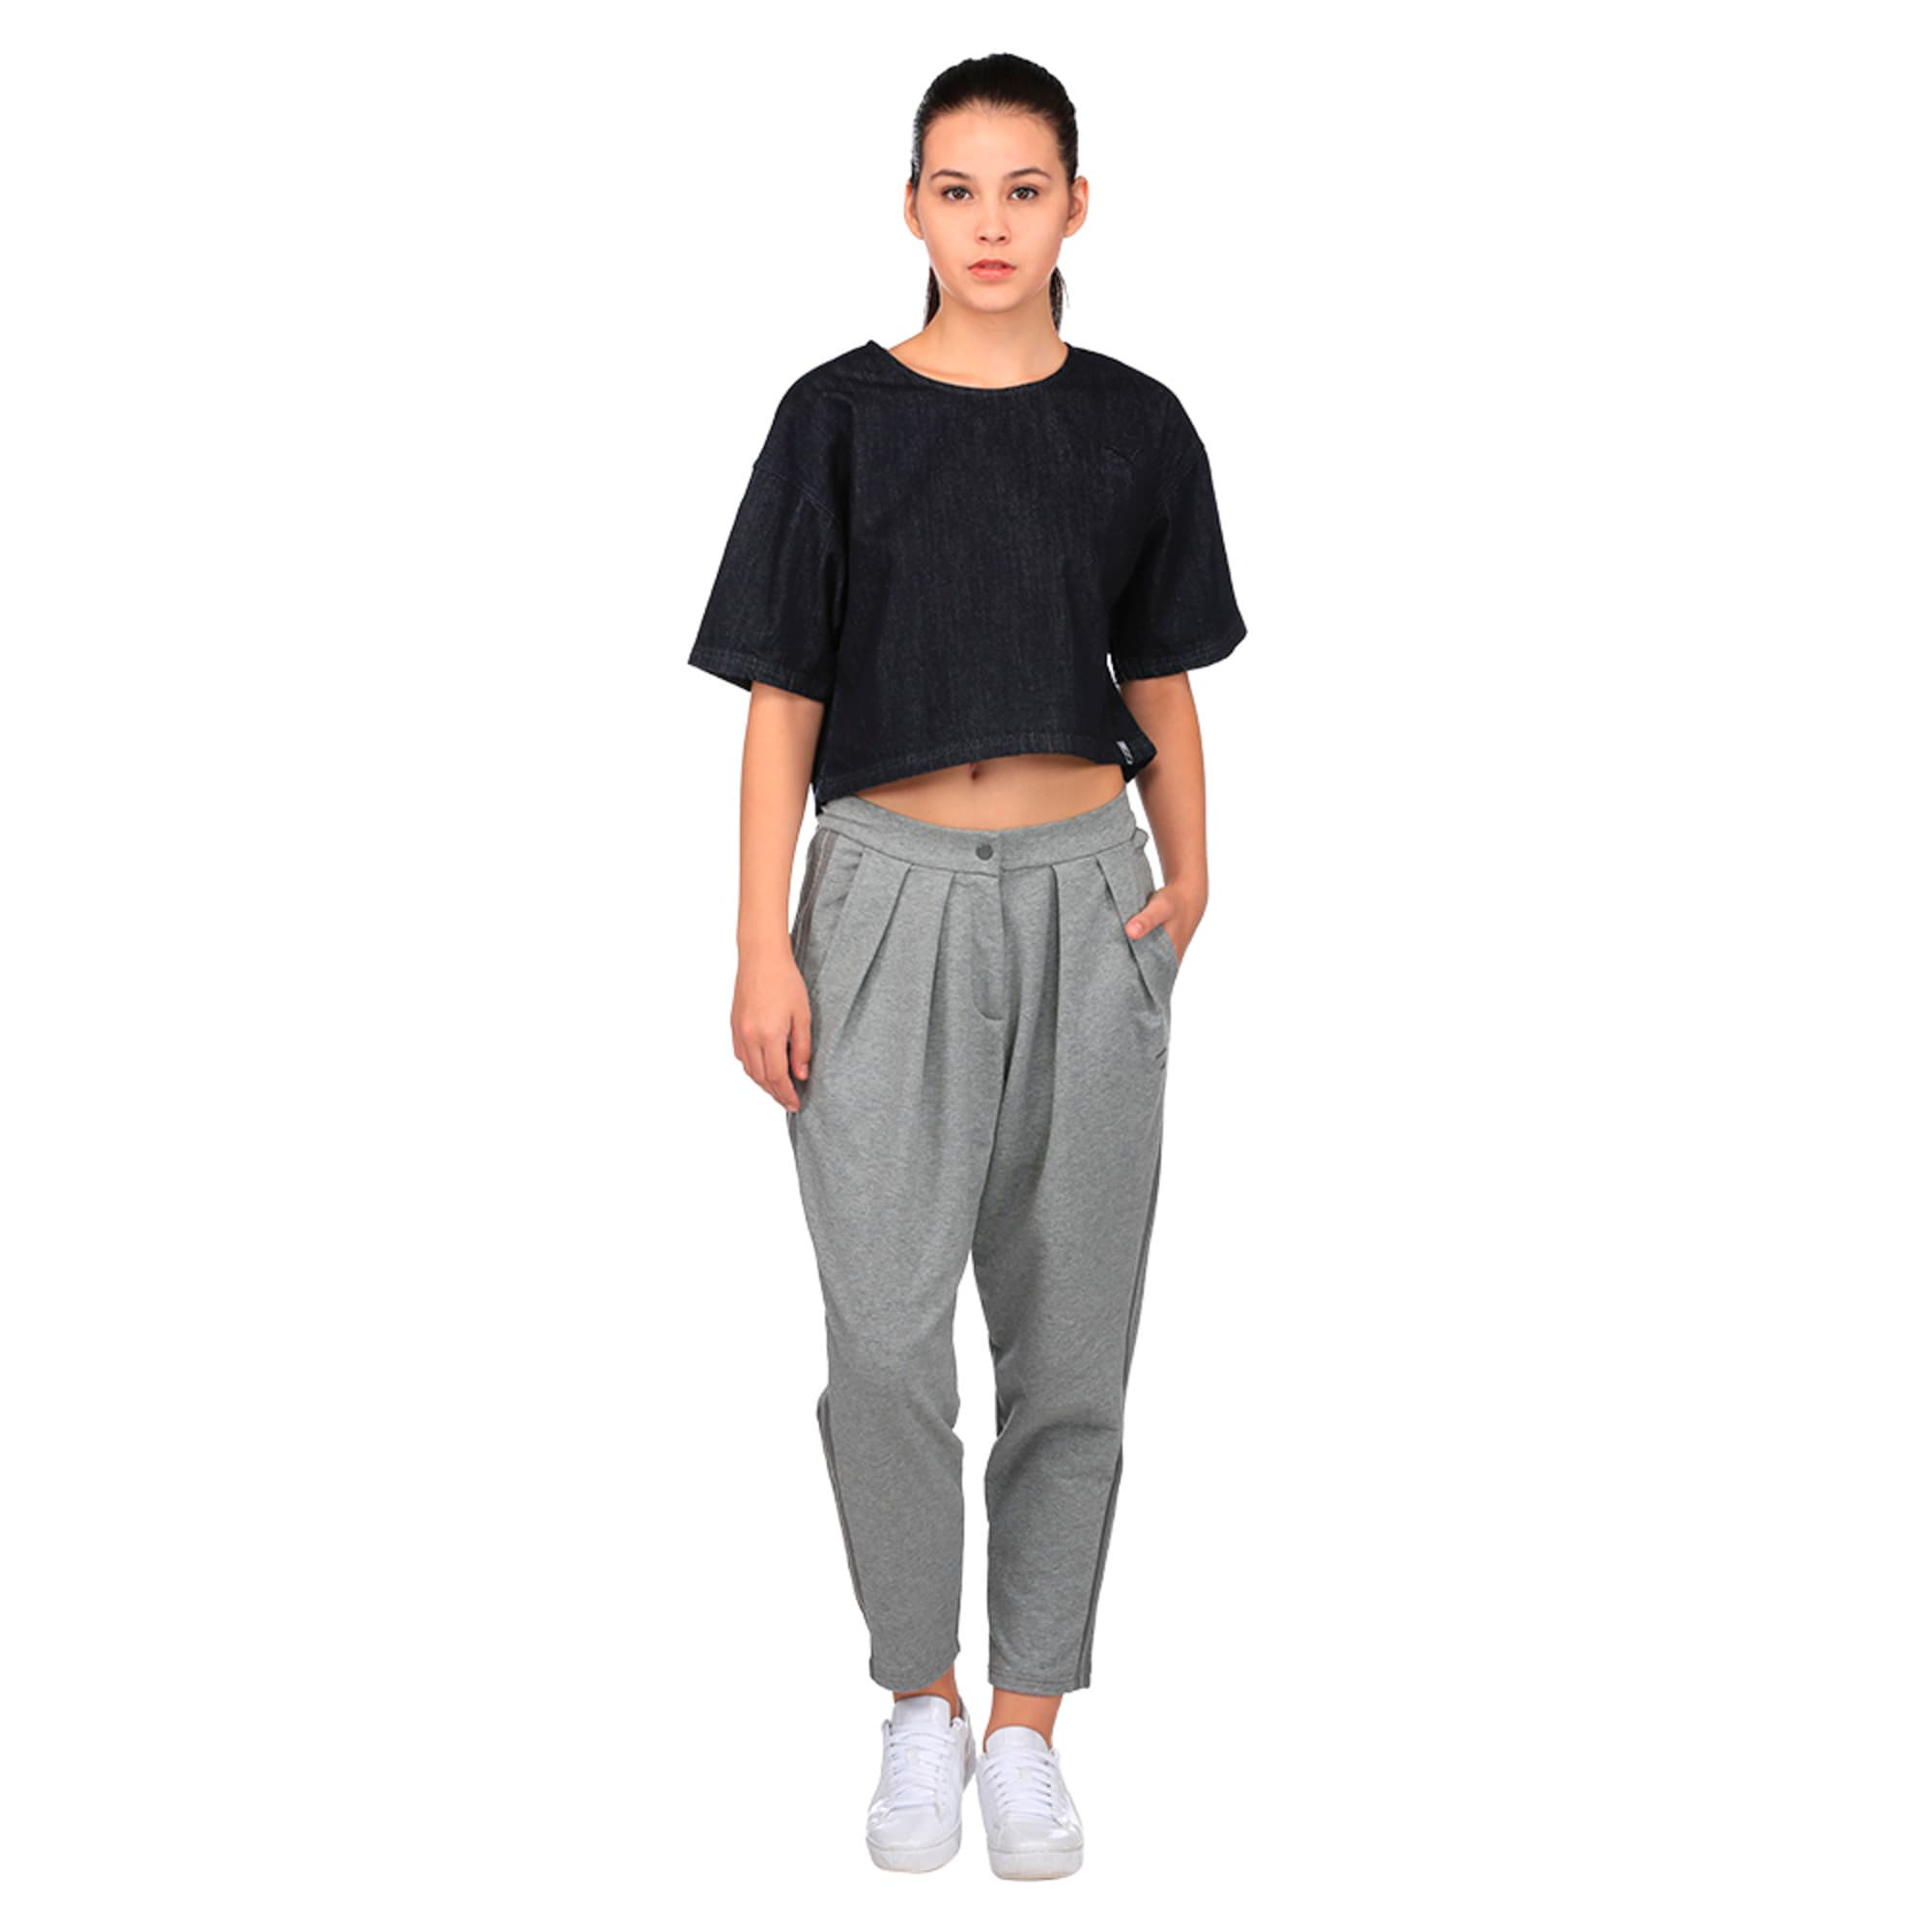 Thumbnail 4 of Evolution Women's Tape High Waist Sweatpants, Medium Gray Heather, medium-IND